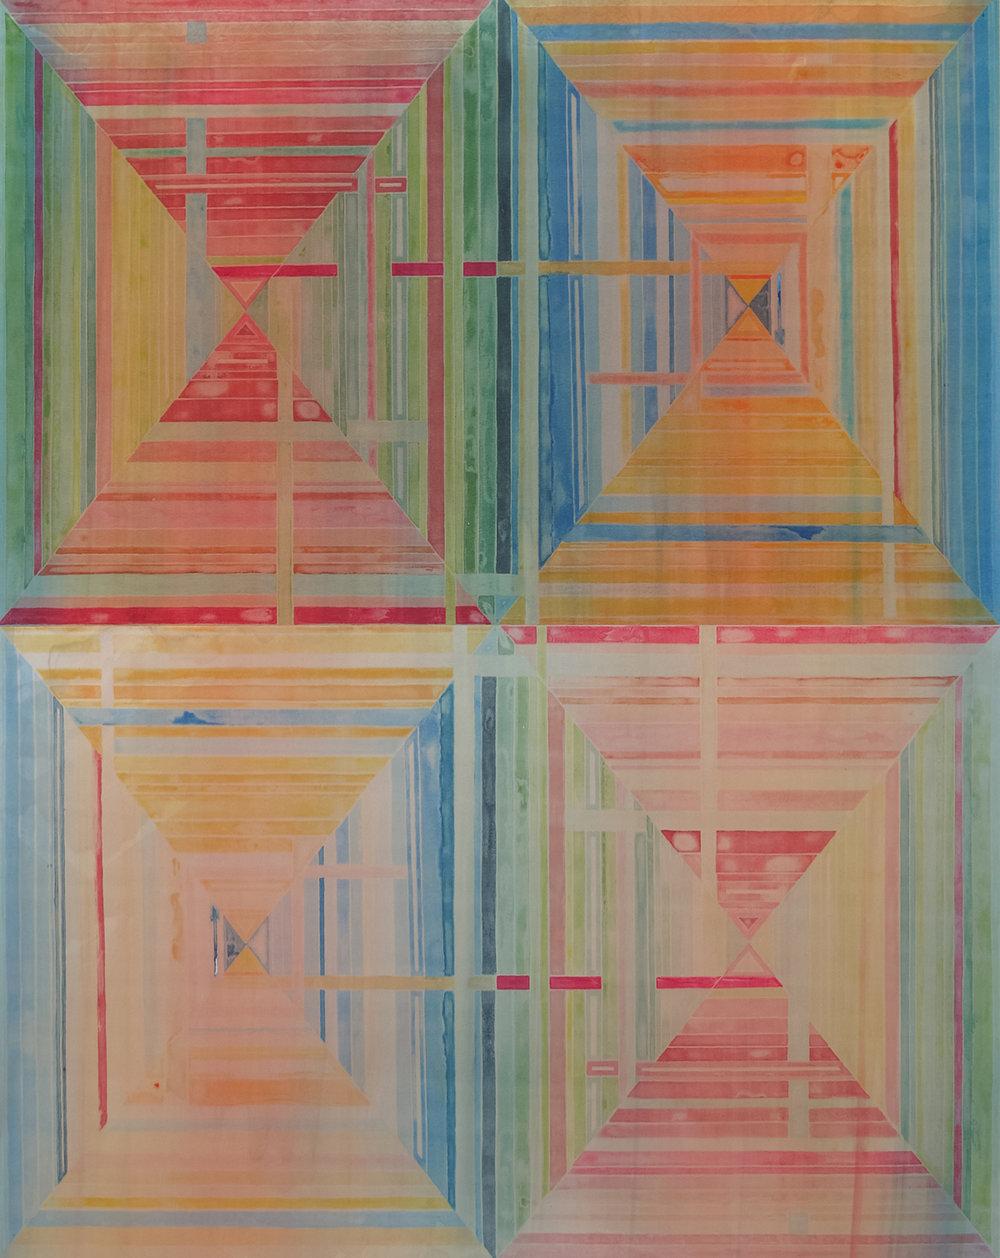 Josh Bindewald, Untitled, monotype